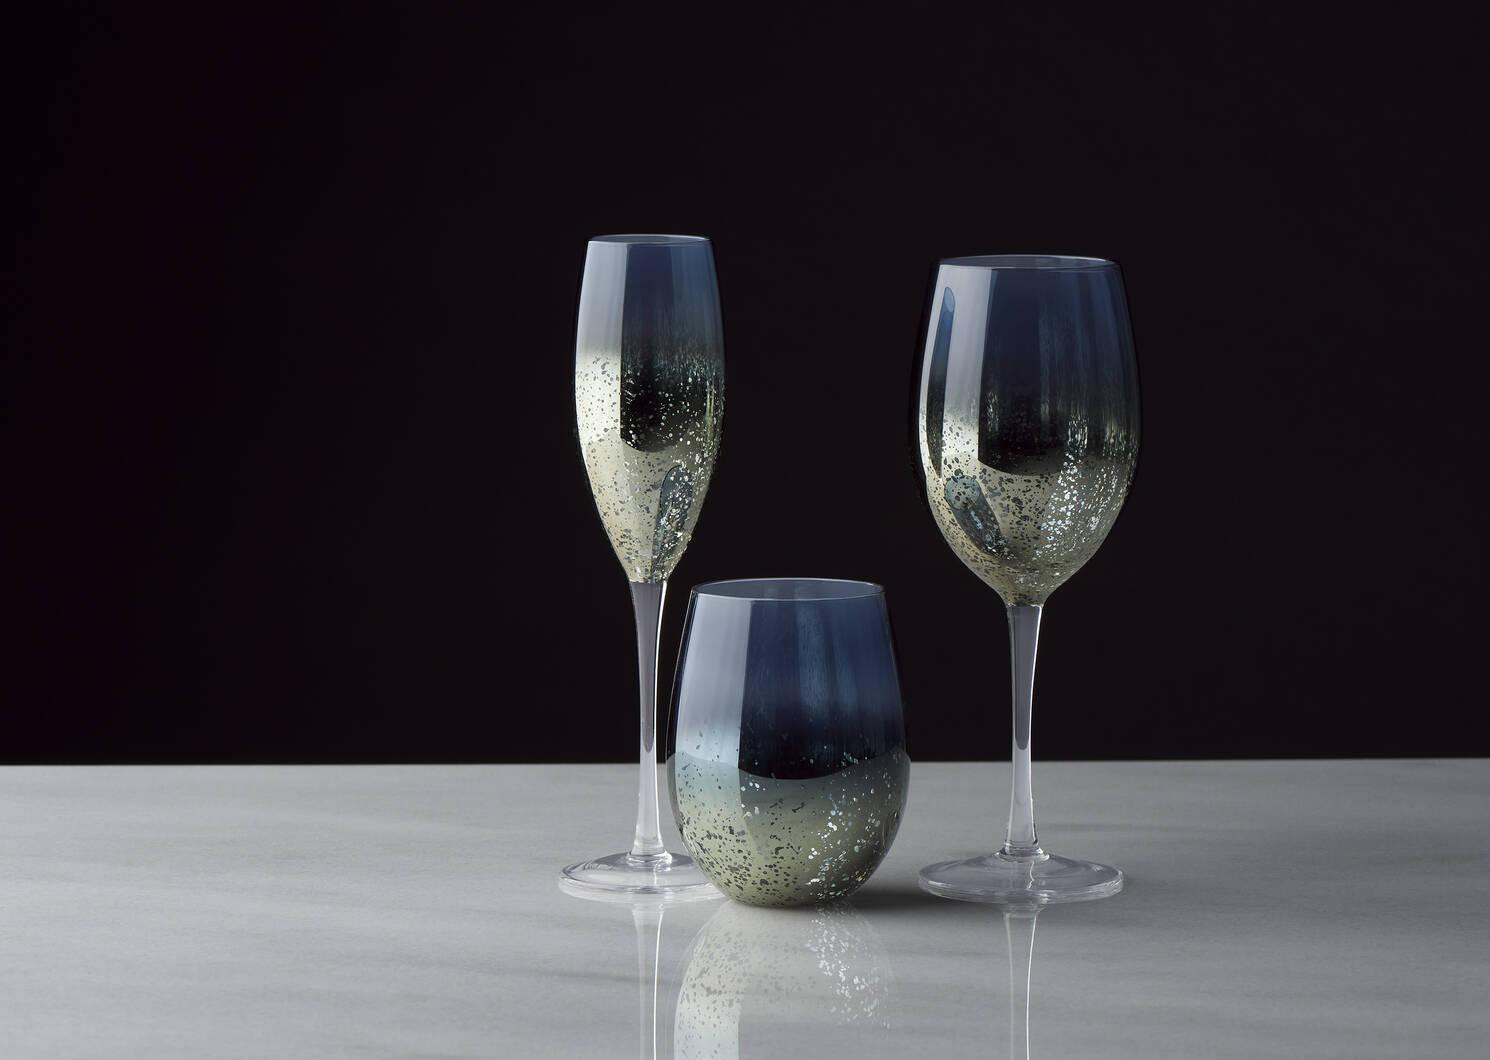 Rhapsody Wine Glass Blue/Haze